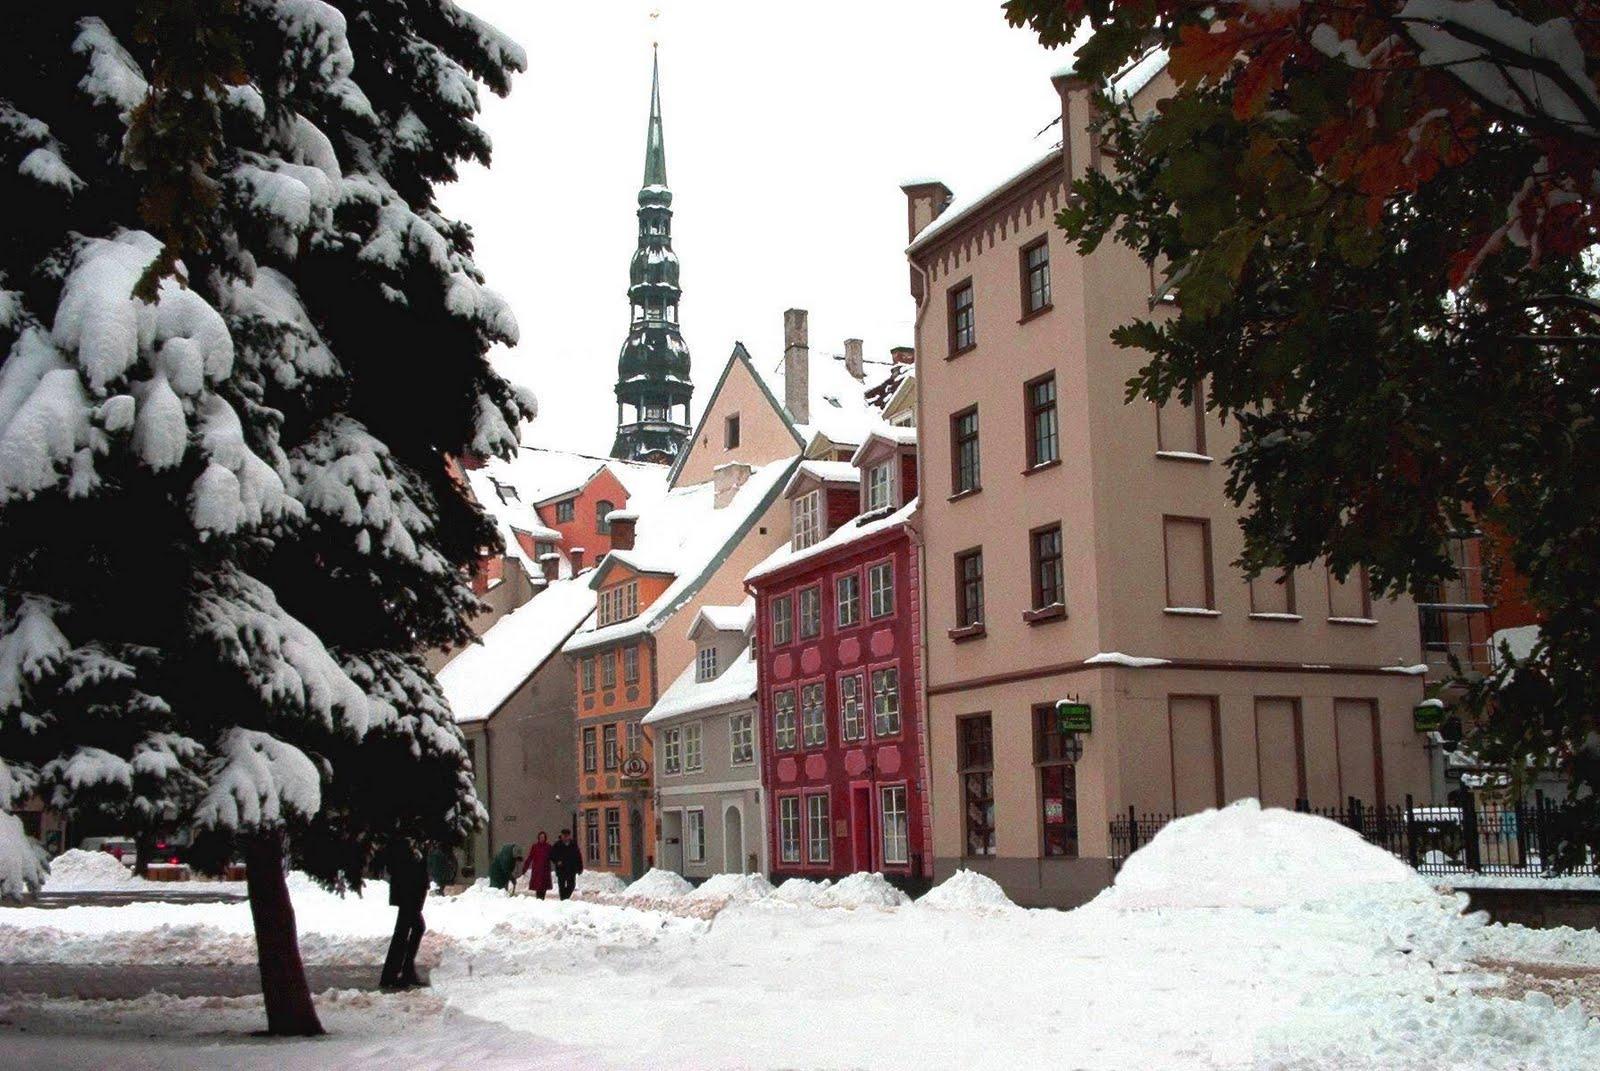 http://3.bp.blogspot.com/-BlmhdDCvVHQ/TvUF91IICsI/AAAAAAAAF18/W37h4YZ8ijI/s1600/riga_liv_snow.jpg